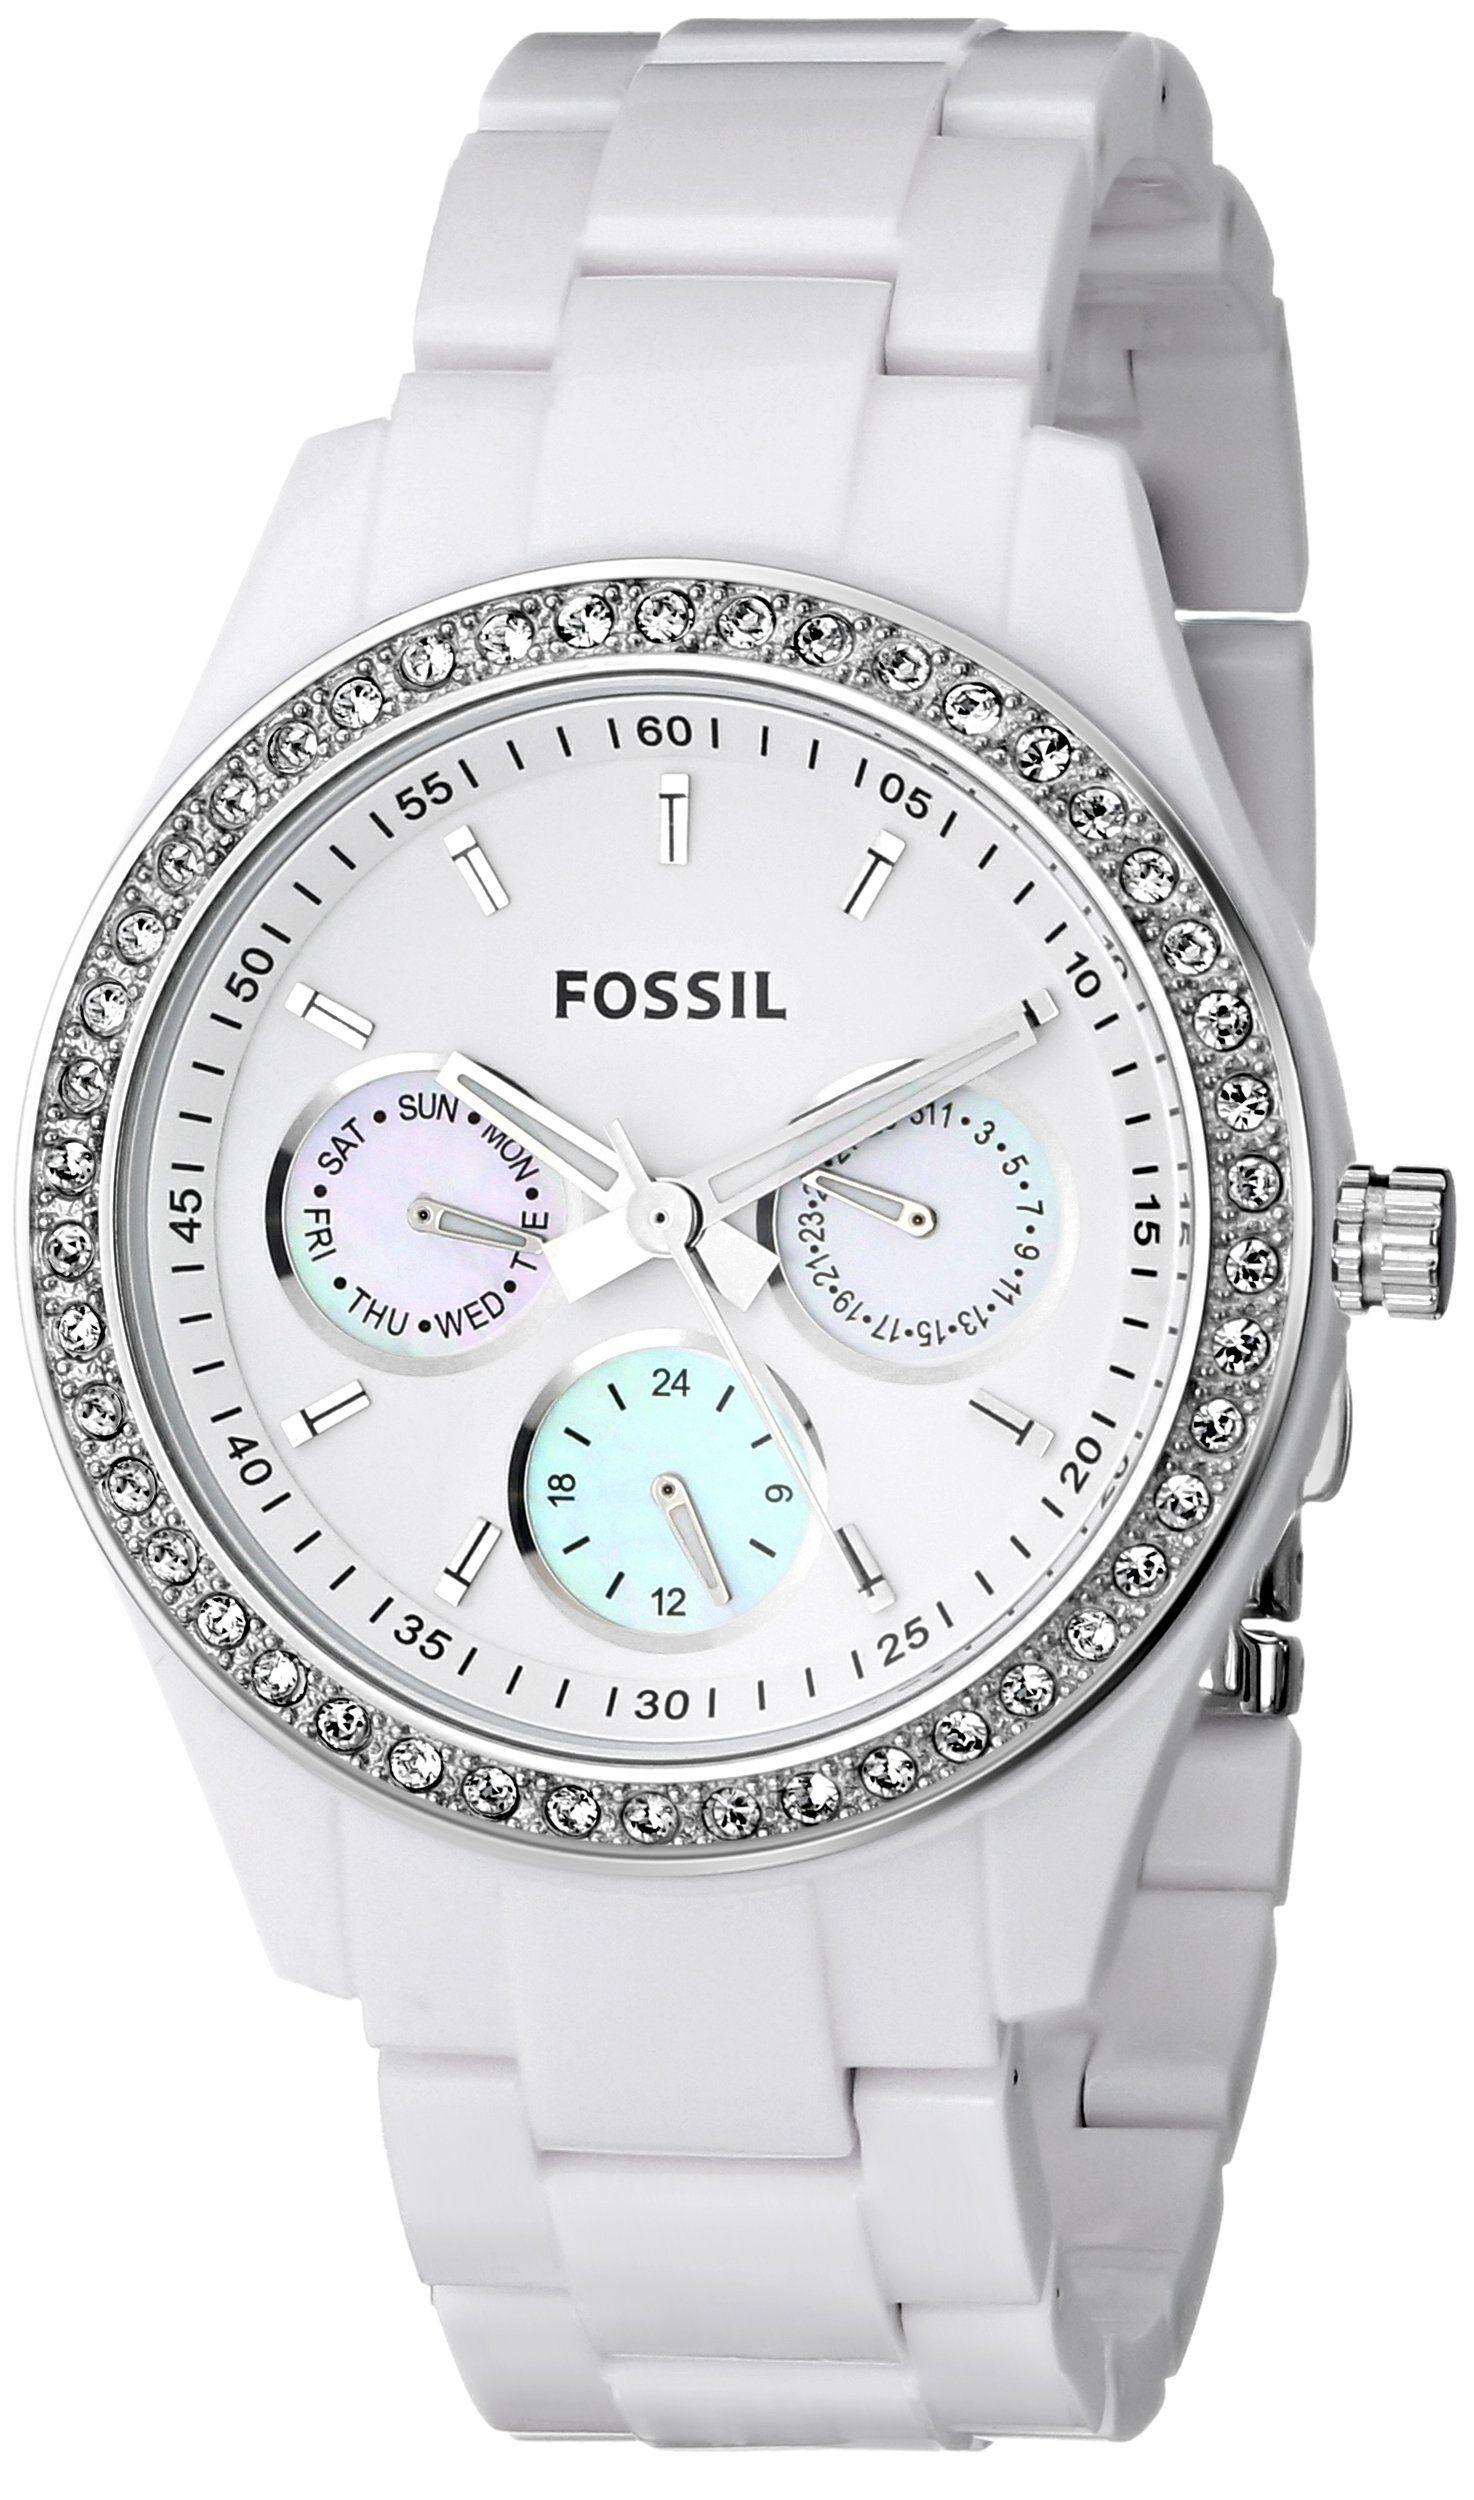 Fossil Stella White Dial Women's Quartz Watch